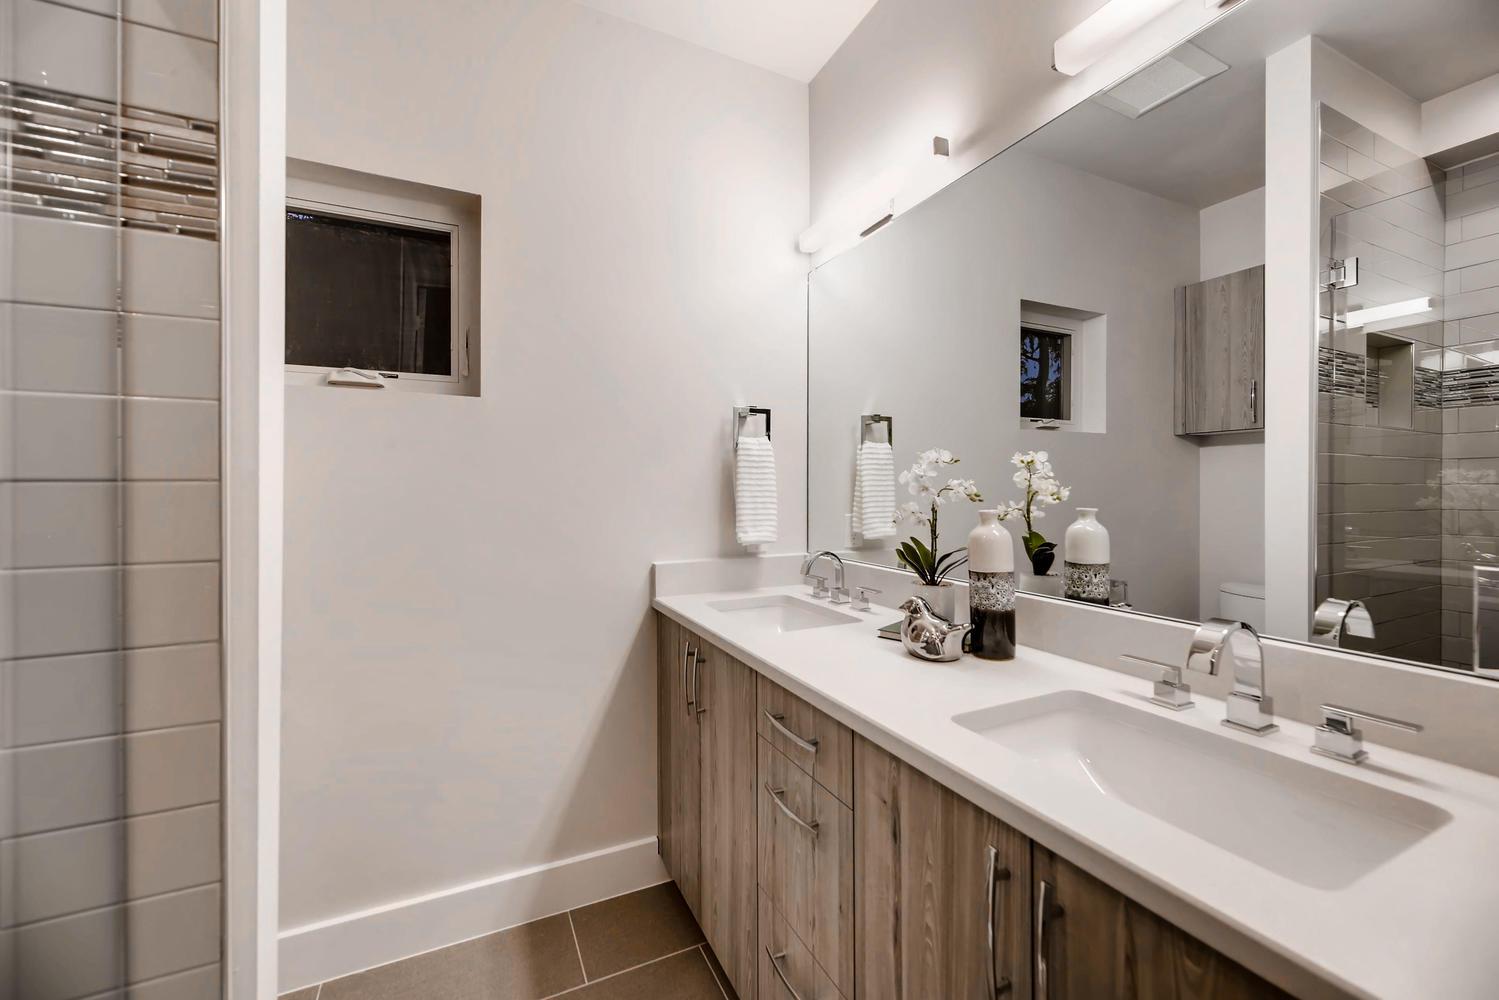 942 S Fulton St Aurora CO-large-020-10-2nd Floor Bathroom-1500x1000-72dpi.jpg